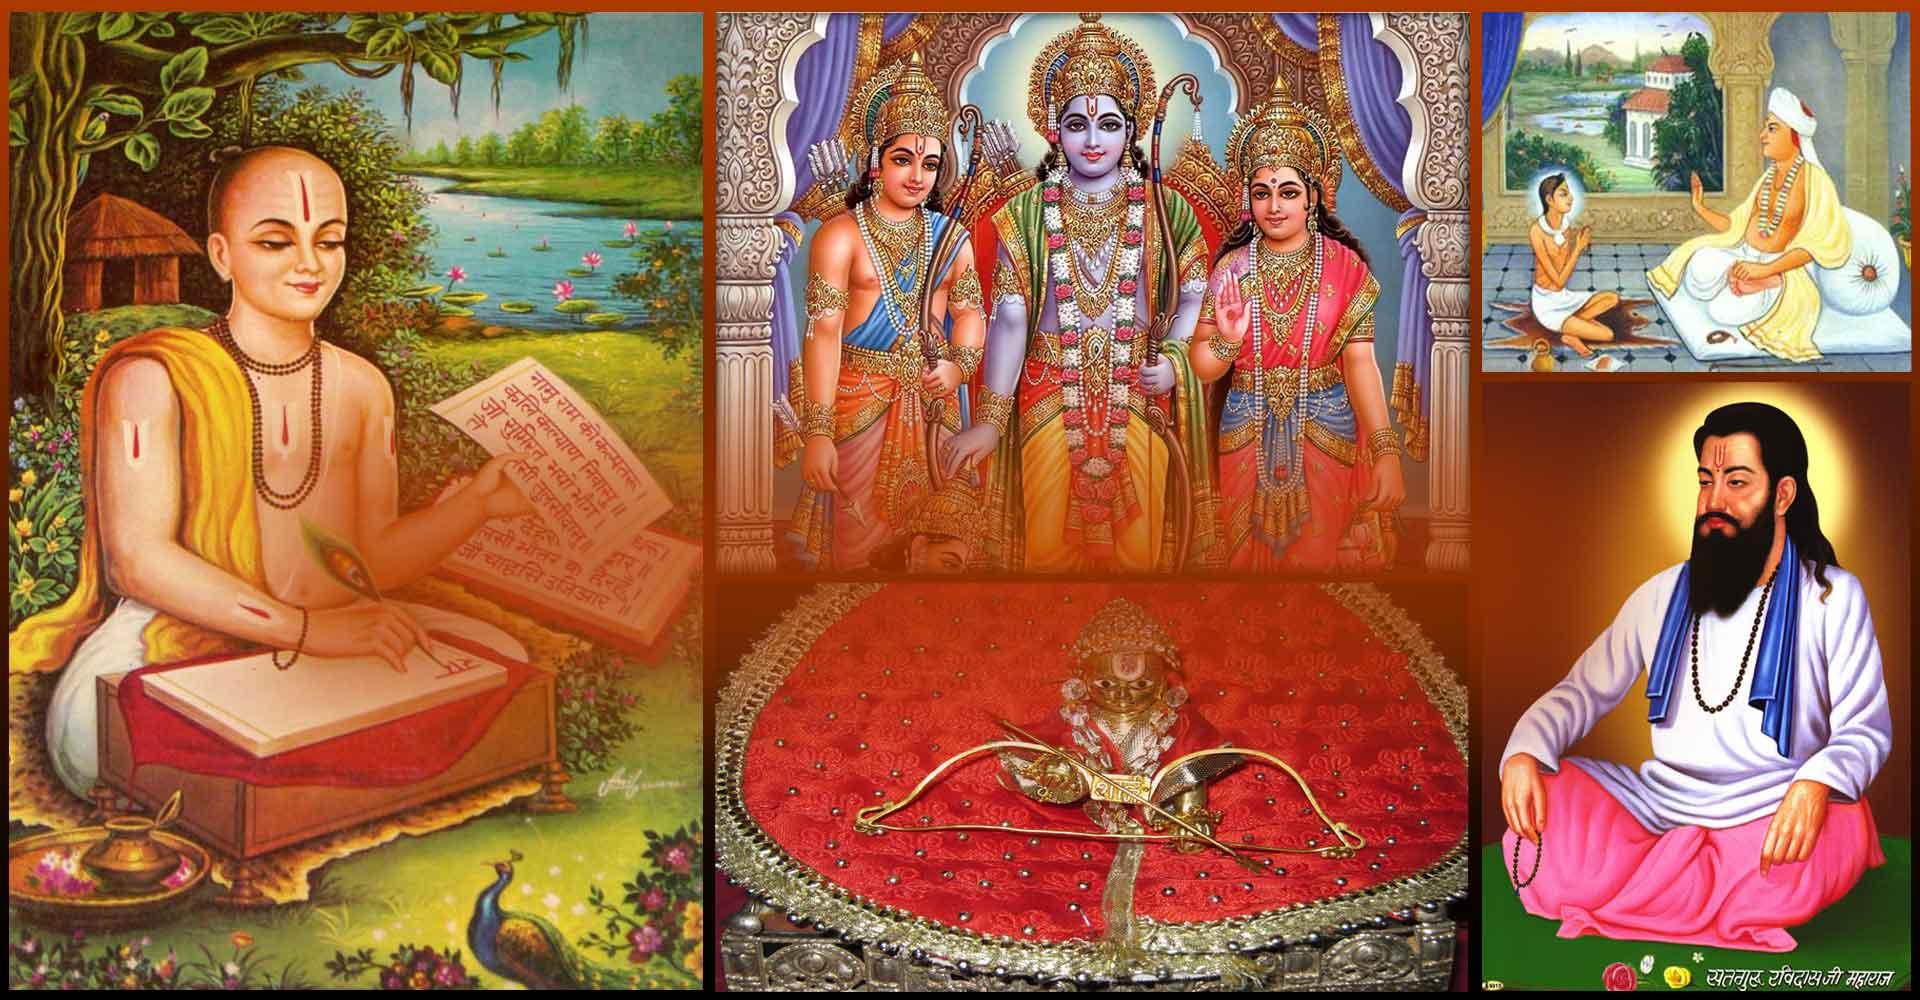 Permalink to: Shri Ram Katha Sansthan Perth